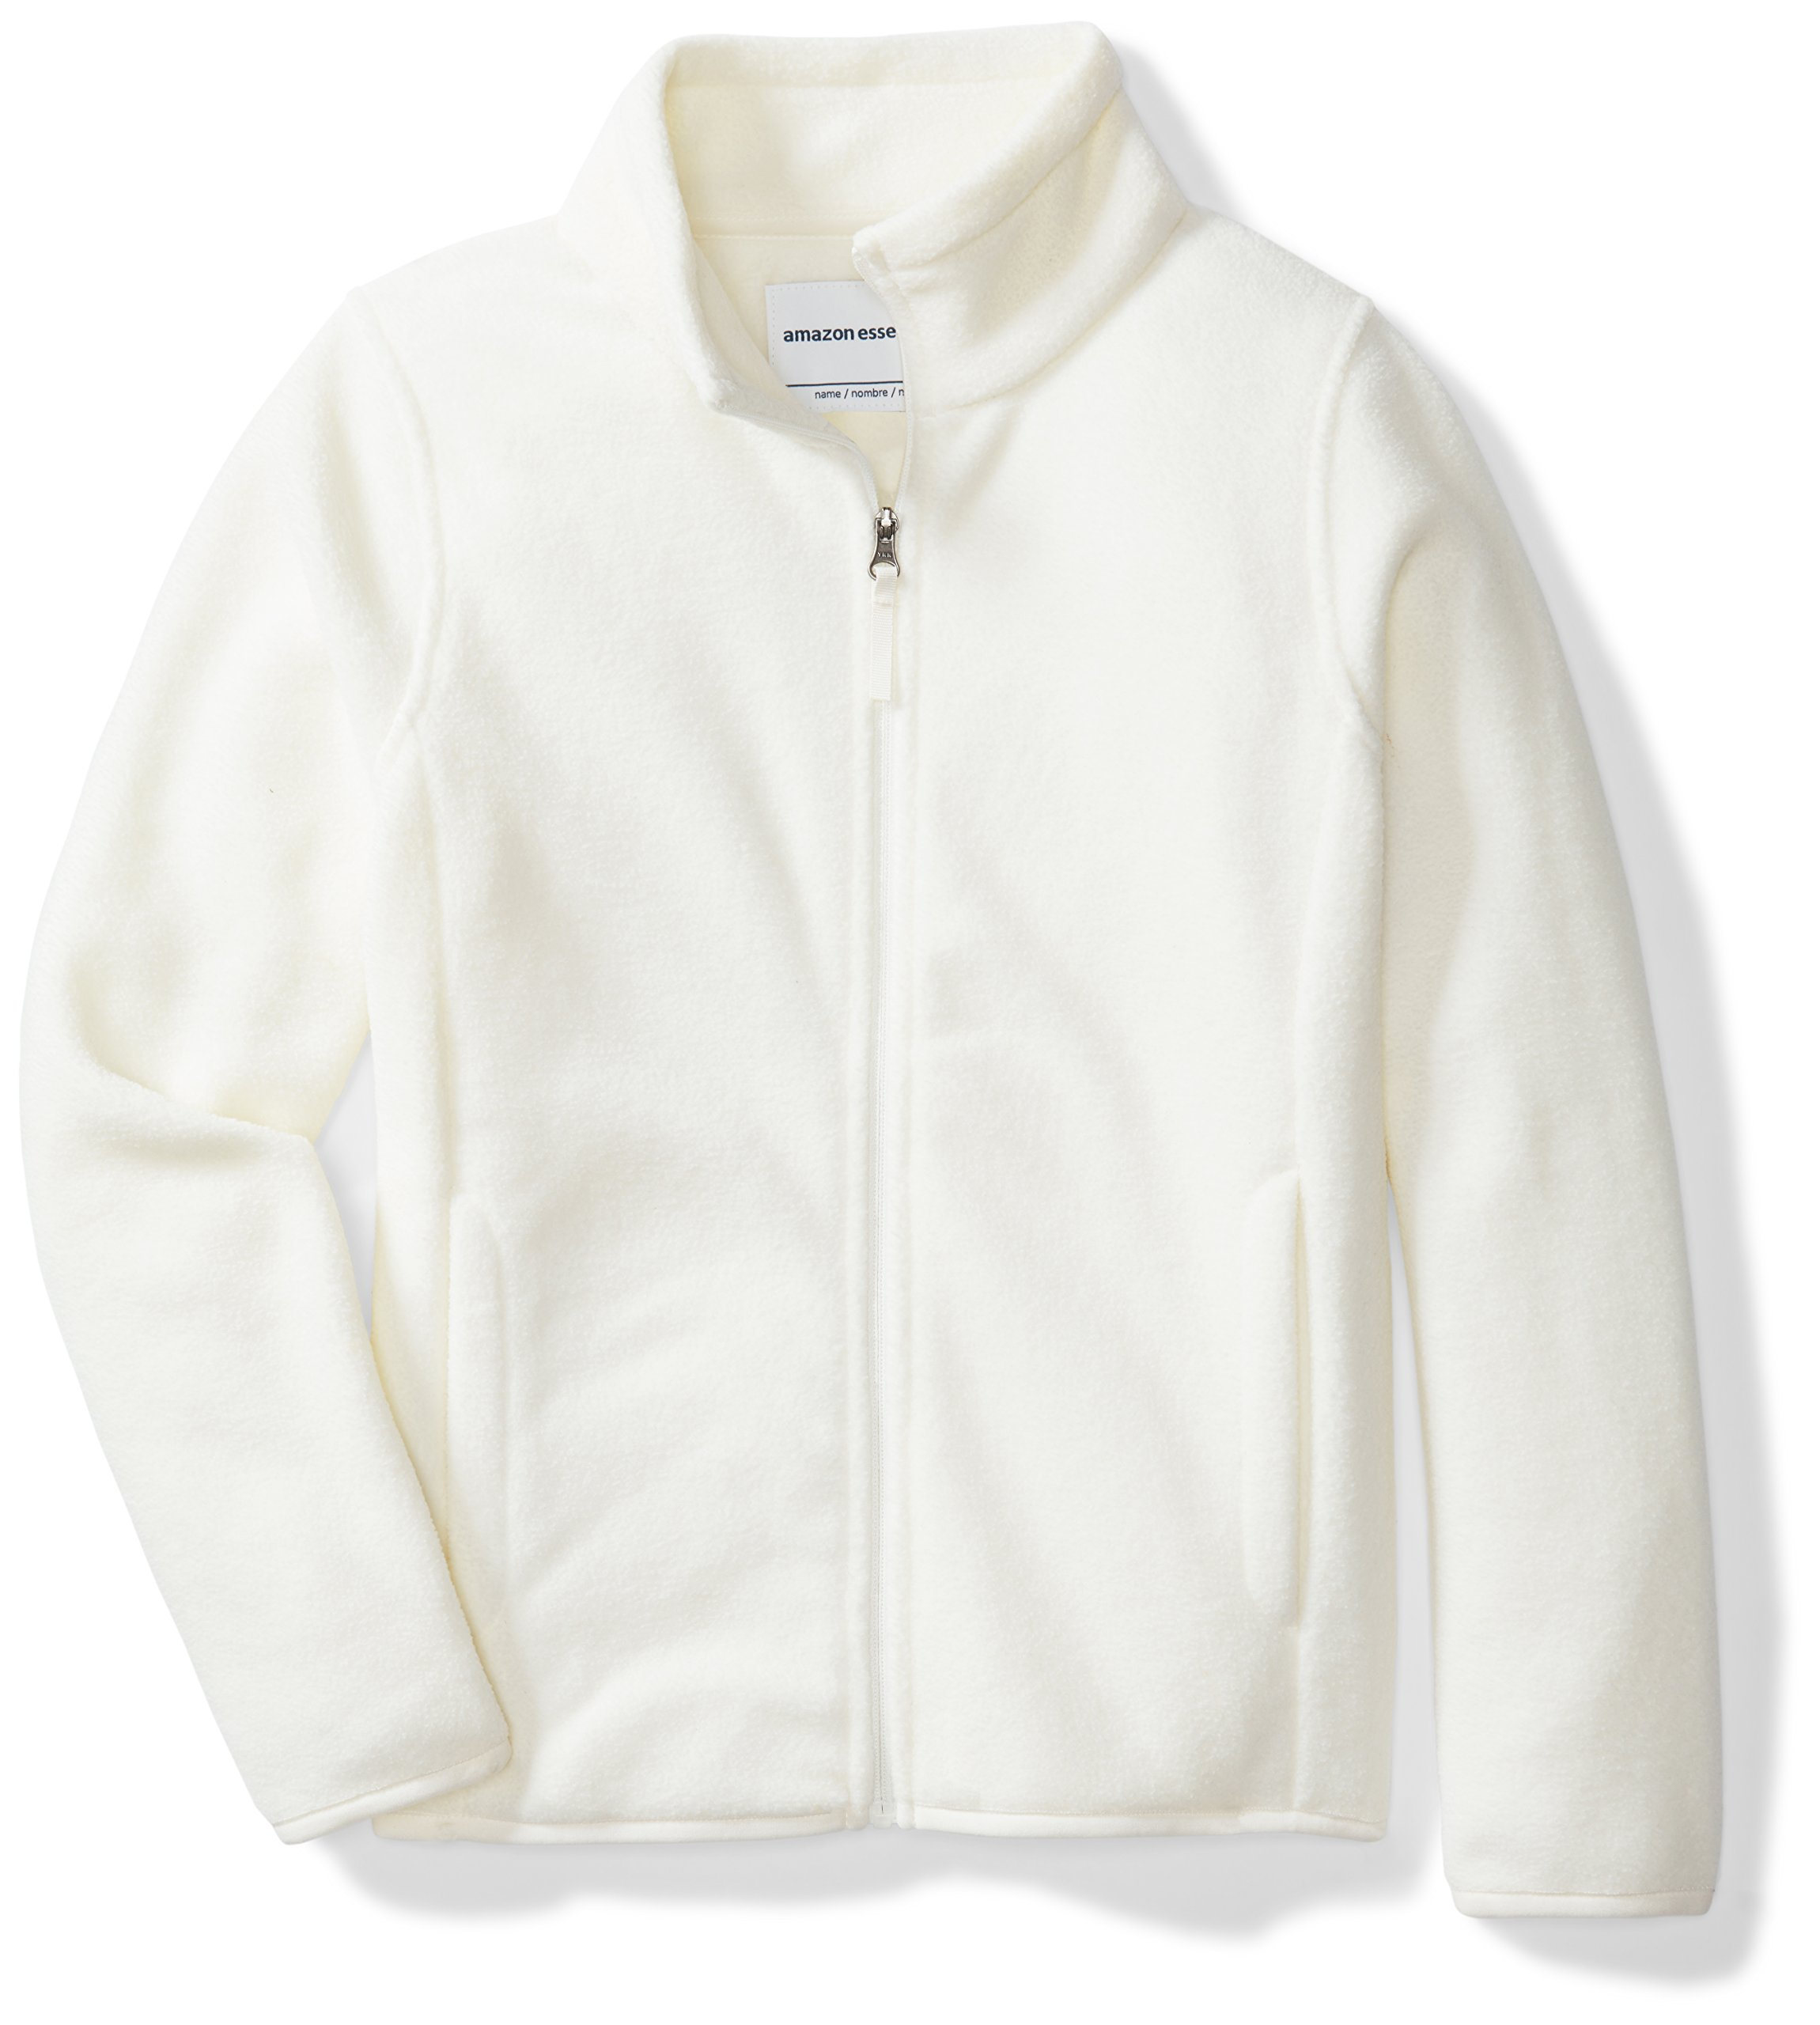 Amazon Essentials Girls' Full-Zip Polar Fleece Jacket, Ivory Snow, X-Small